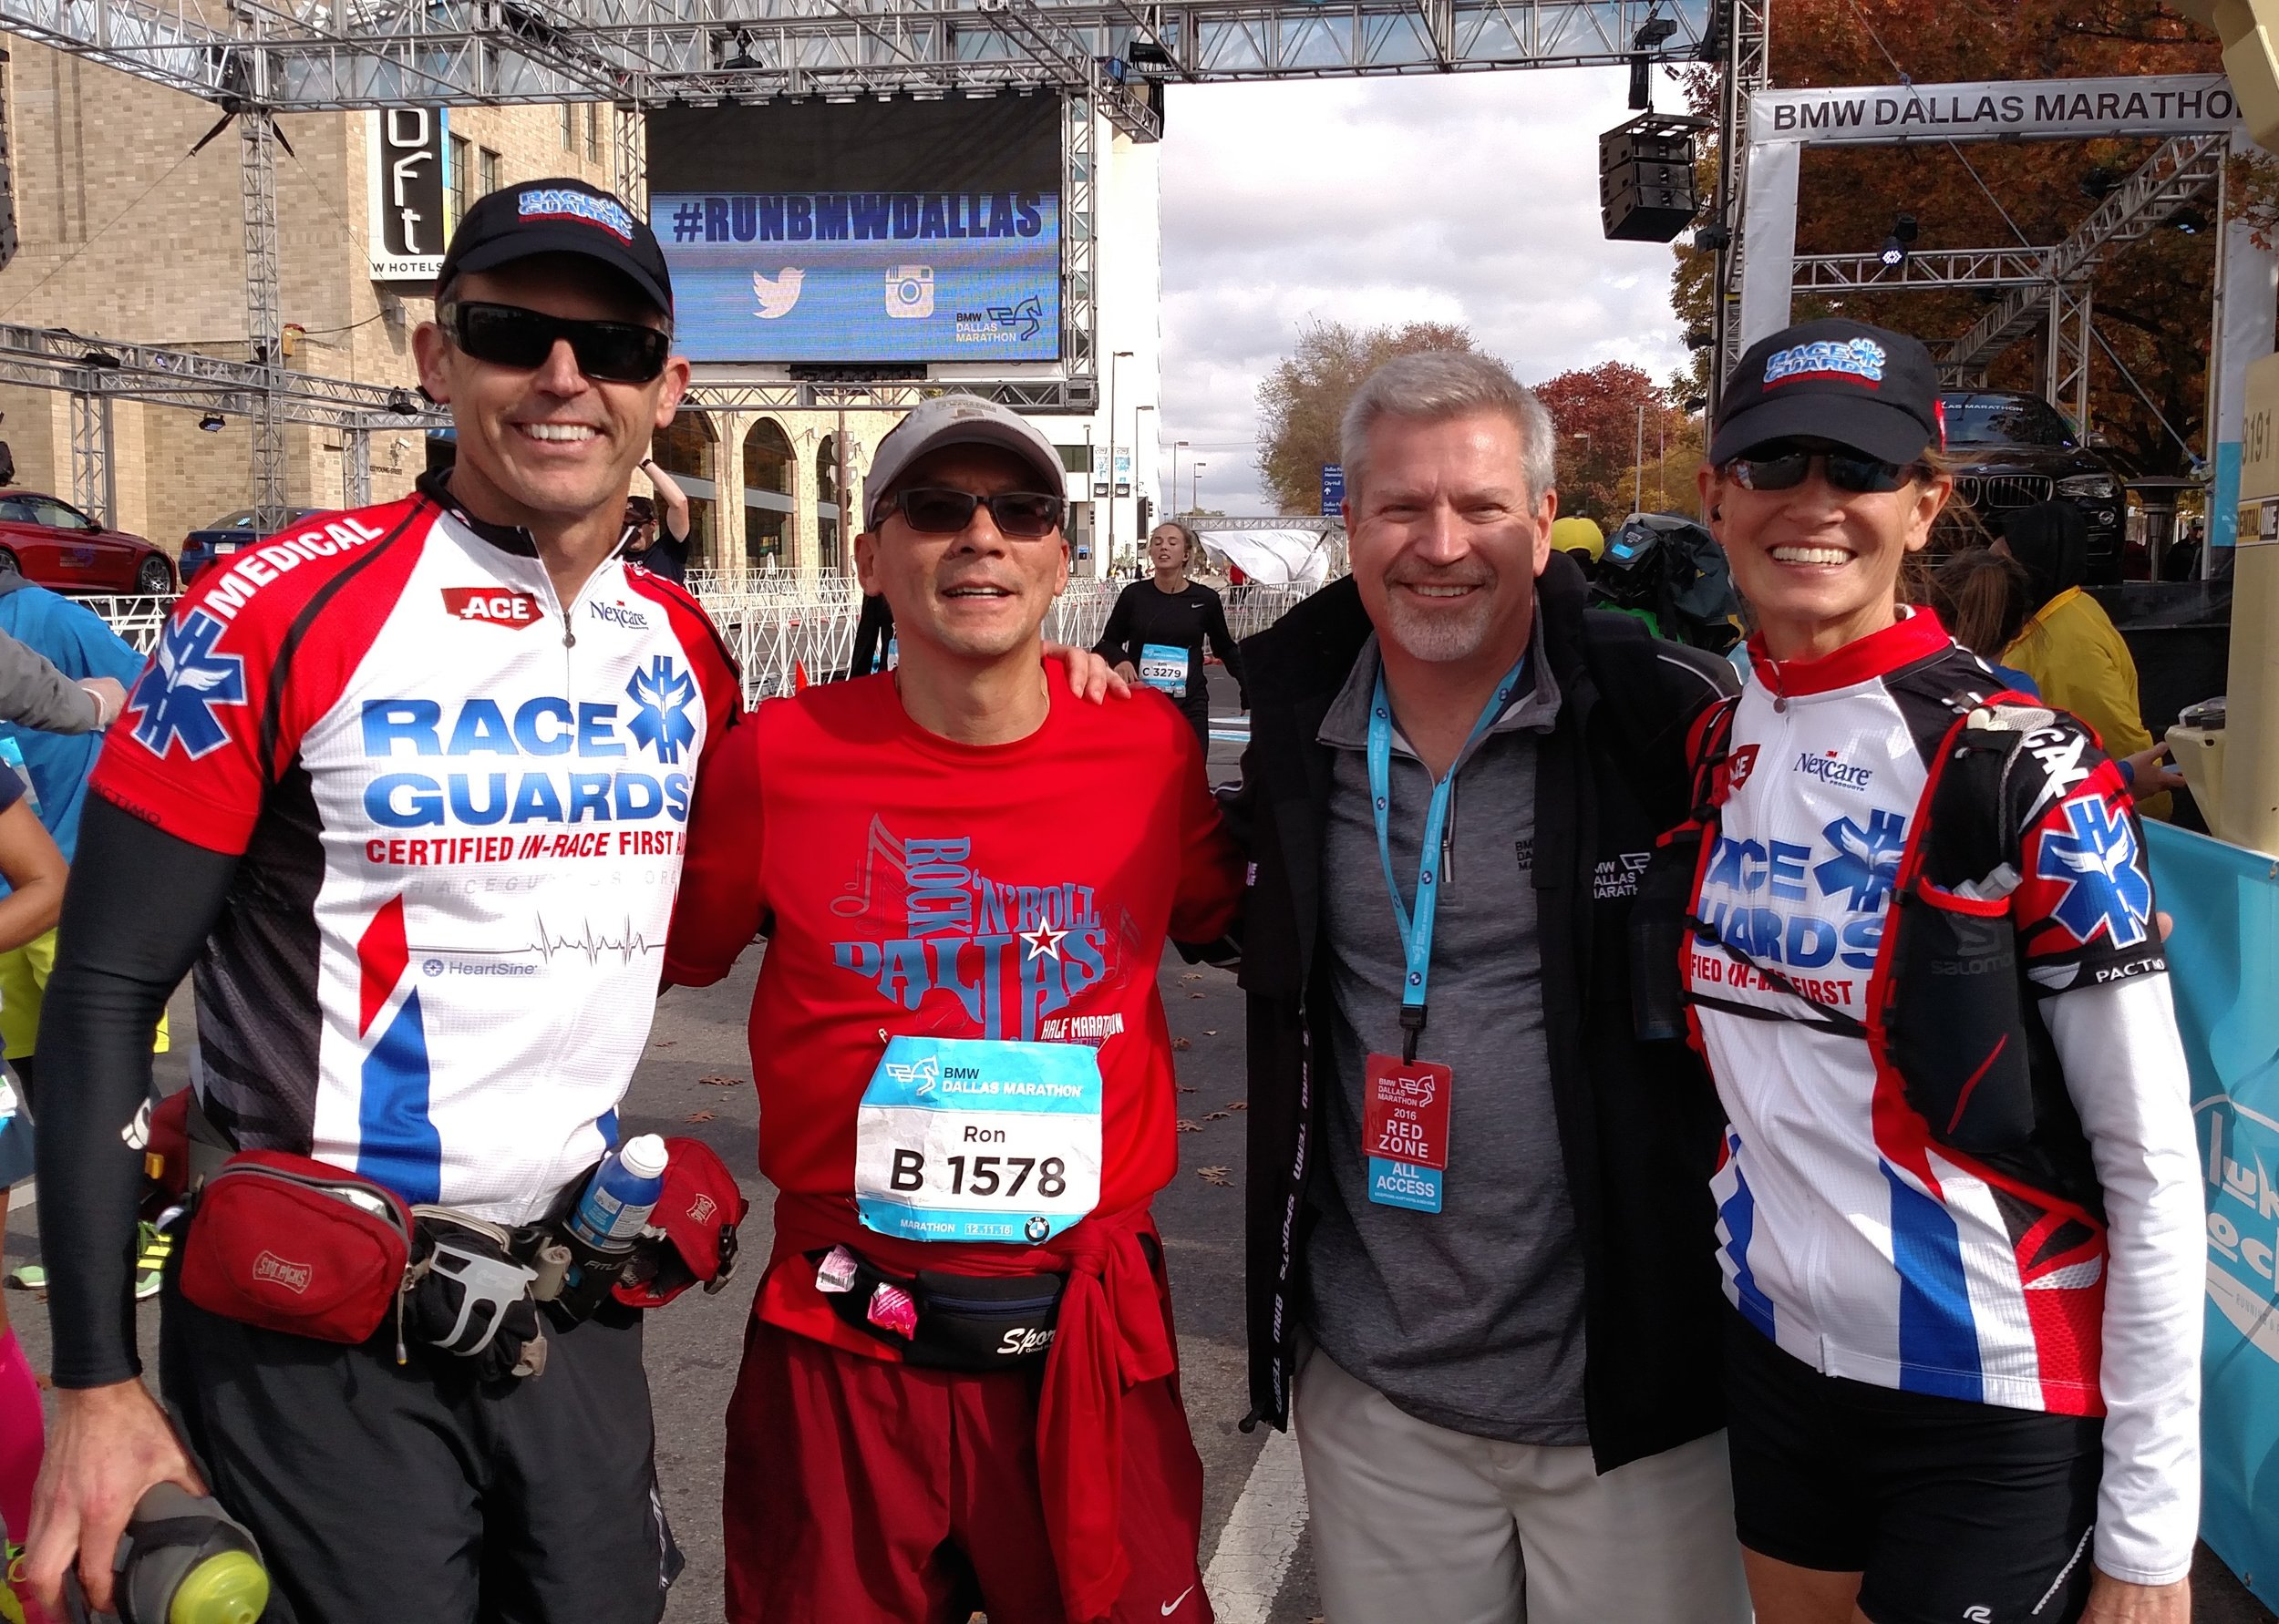 Andy Voggenthaller, Ron Tran, Marcus Grunewald, and Dr Laura Dowd at the BMW Dallas Marathon